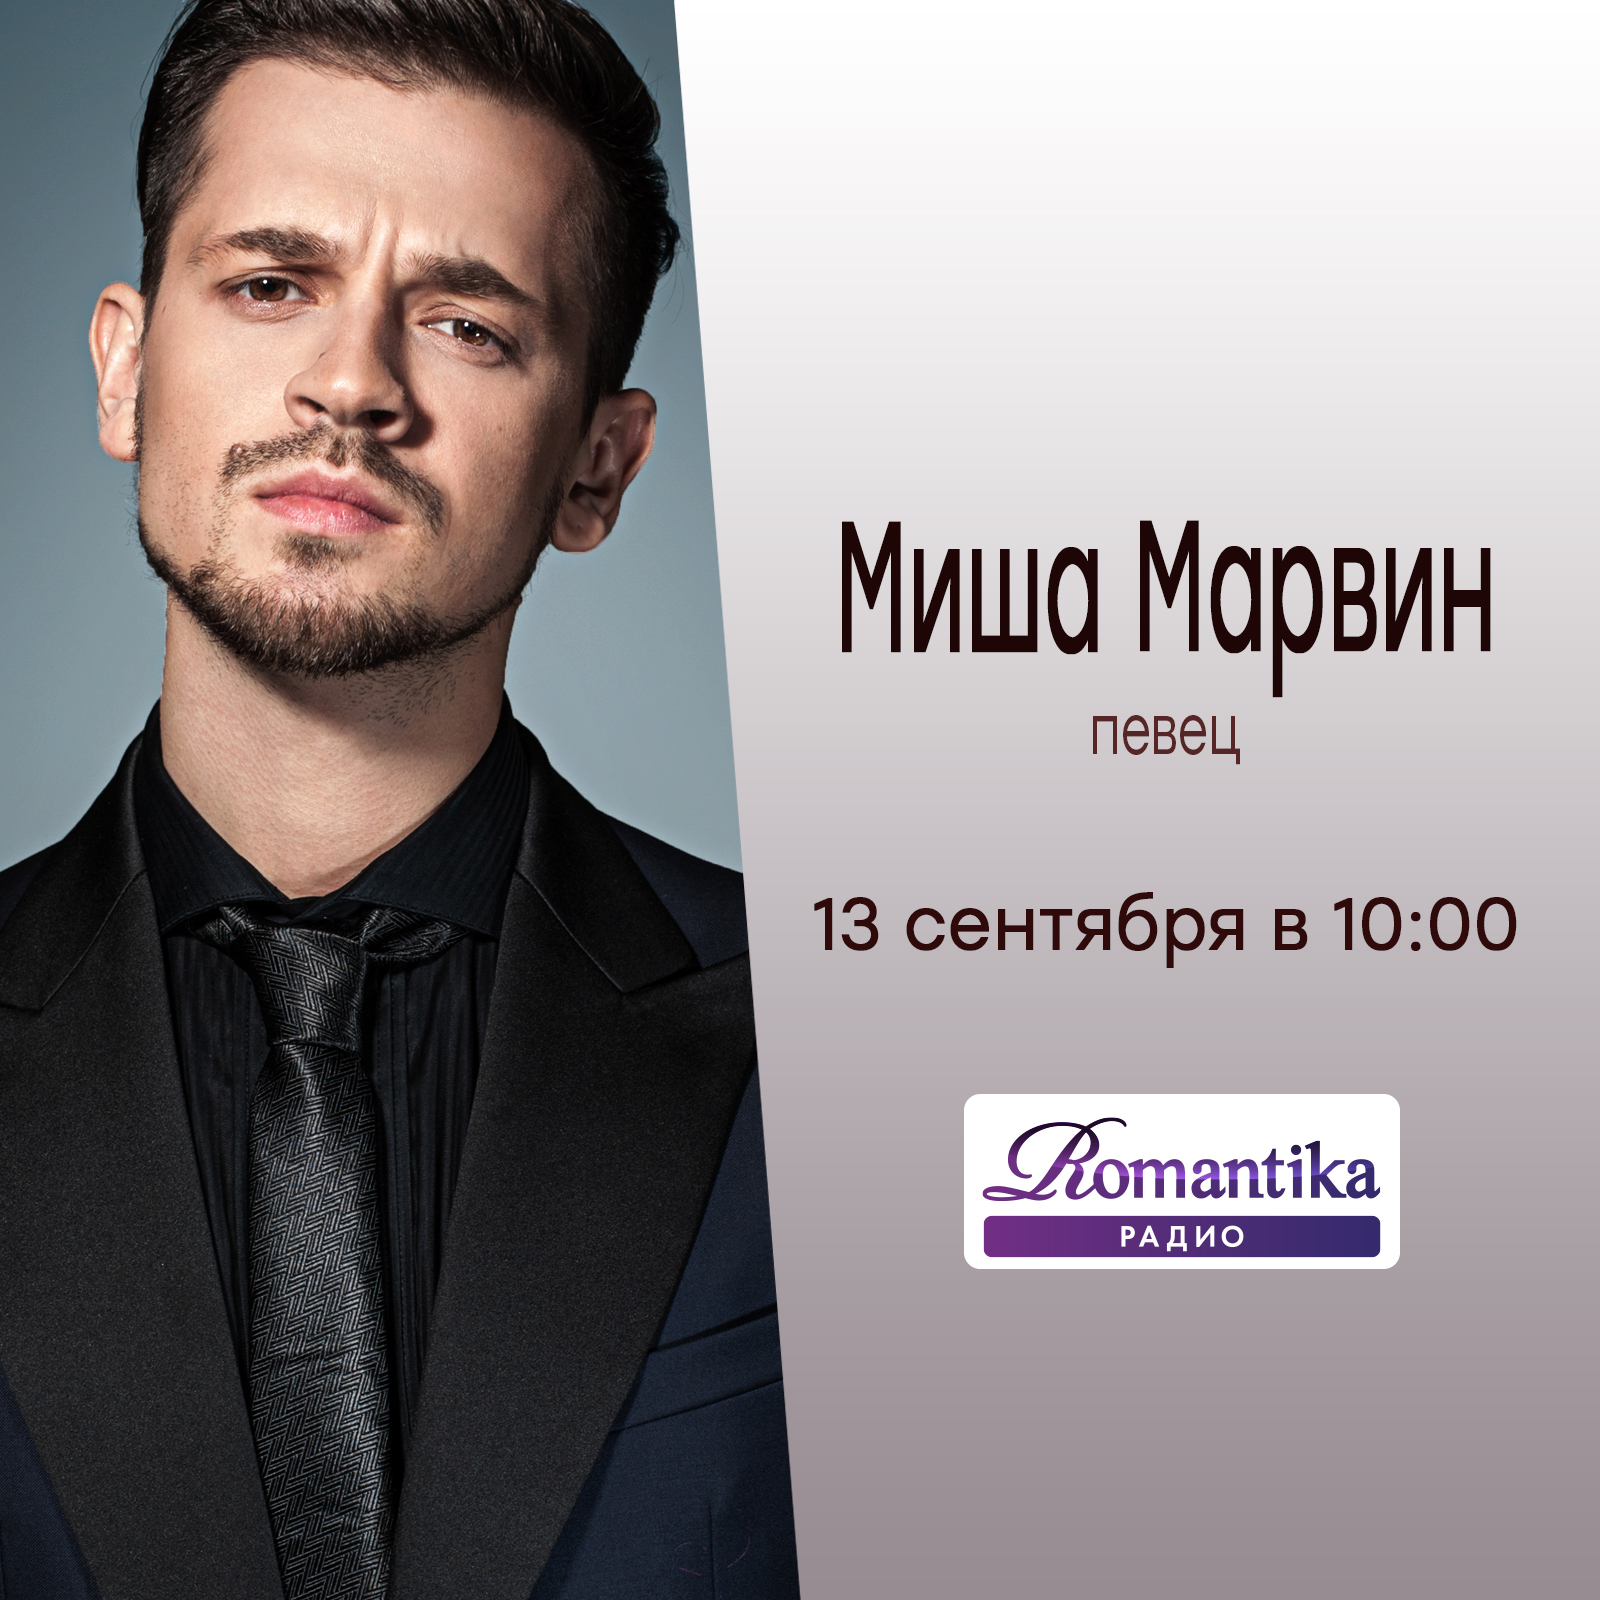 Утро на радио Romantika: 13 сентября – в гостях певец Миша Марвин - Радио Romantika